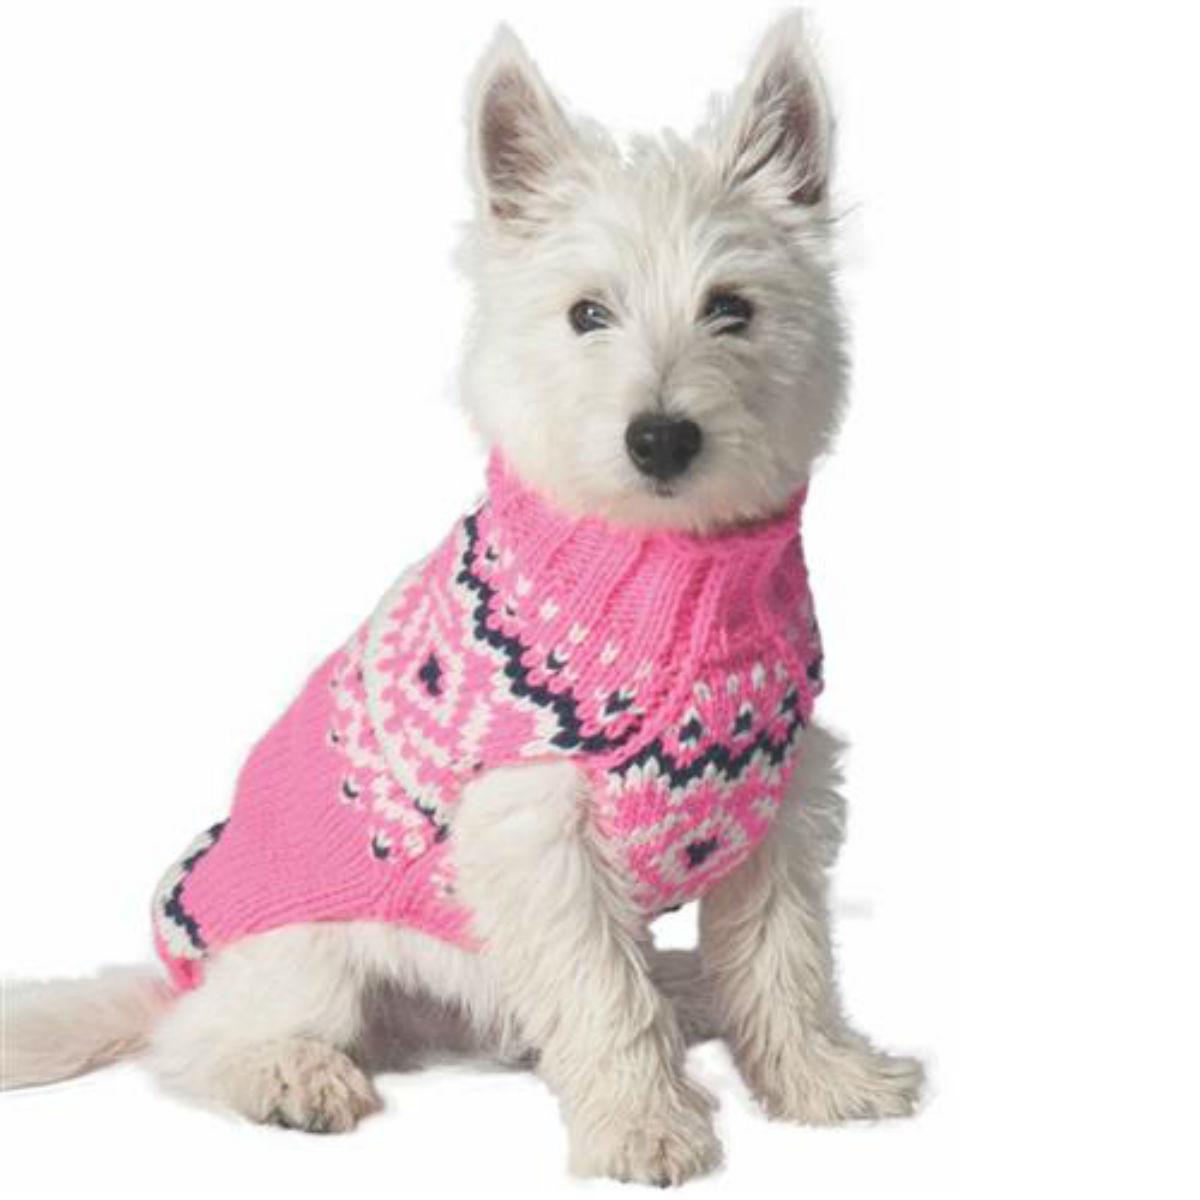 Handmade Nordic Wool Dog Sweater - Pink